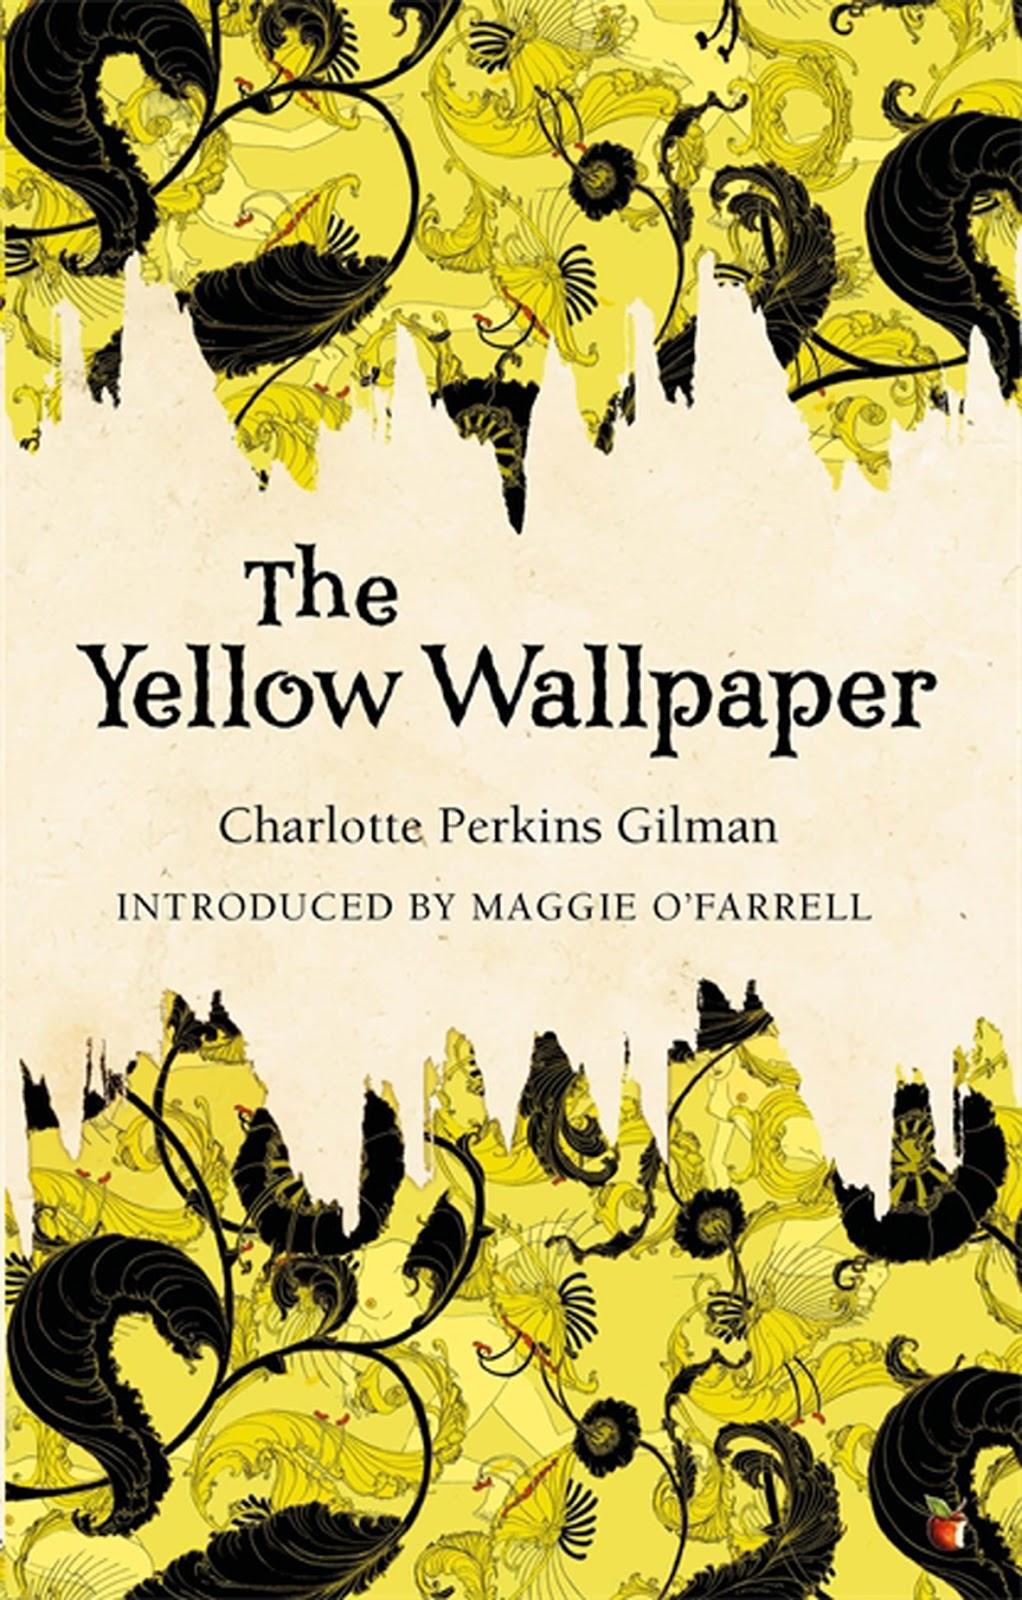 The Yellow Wallpaper Film loopelecom 1022x1600